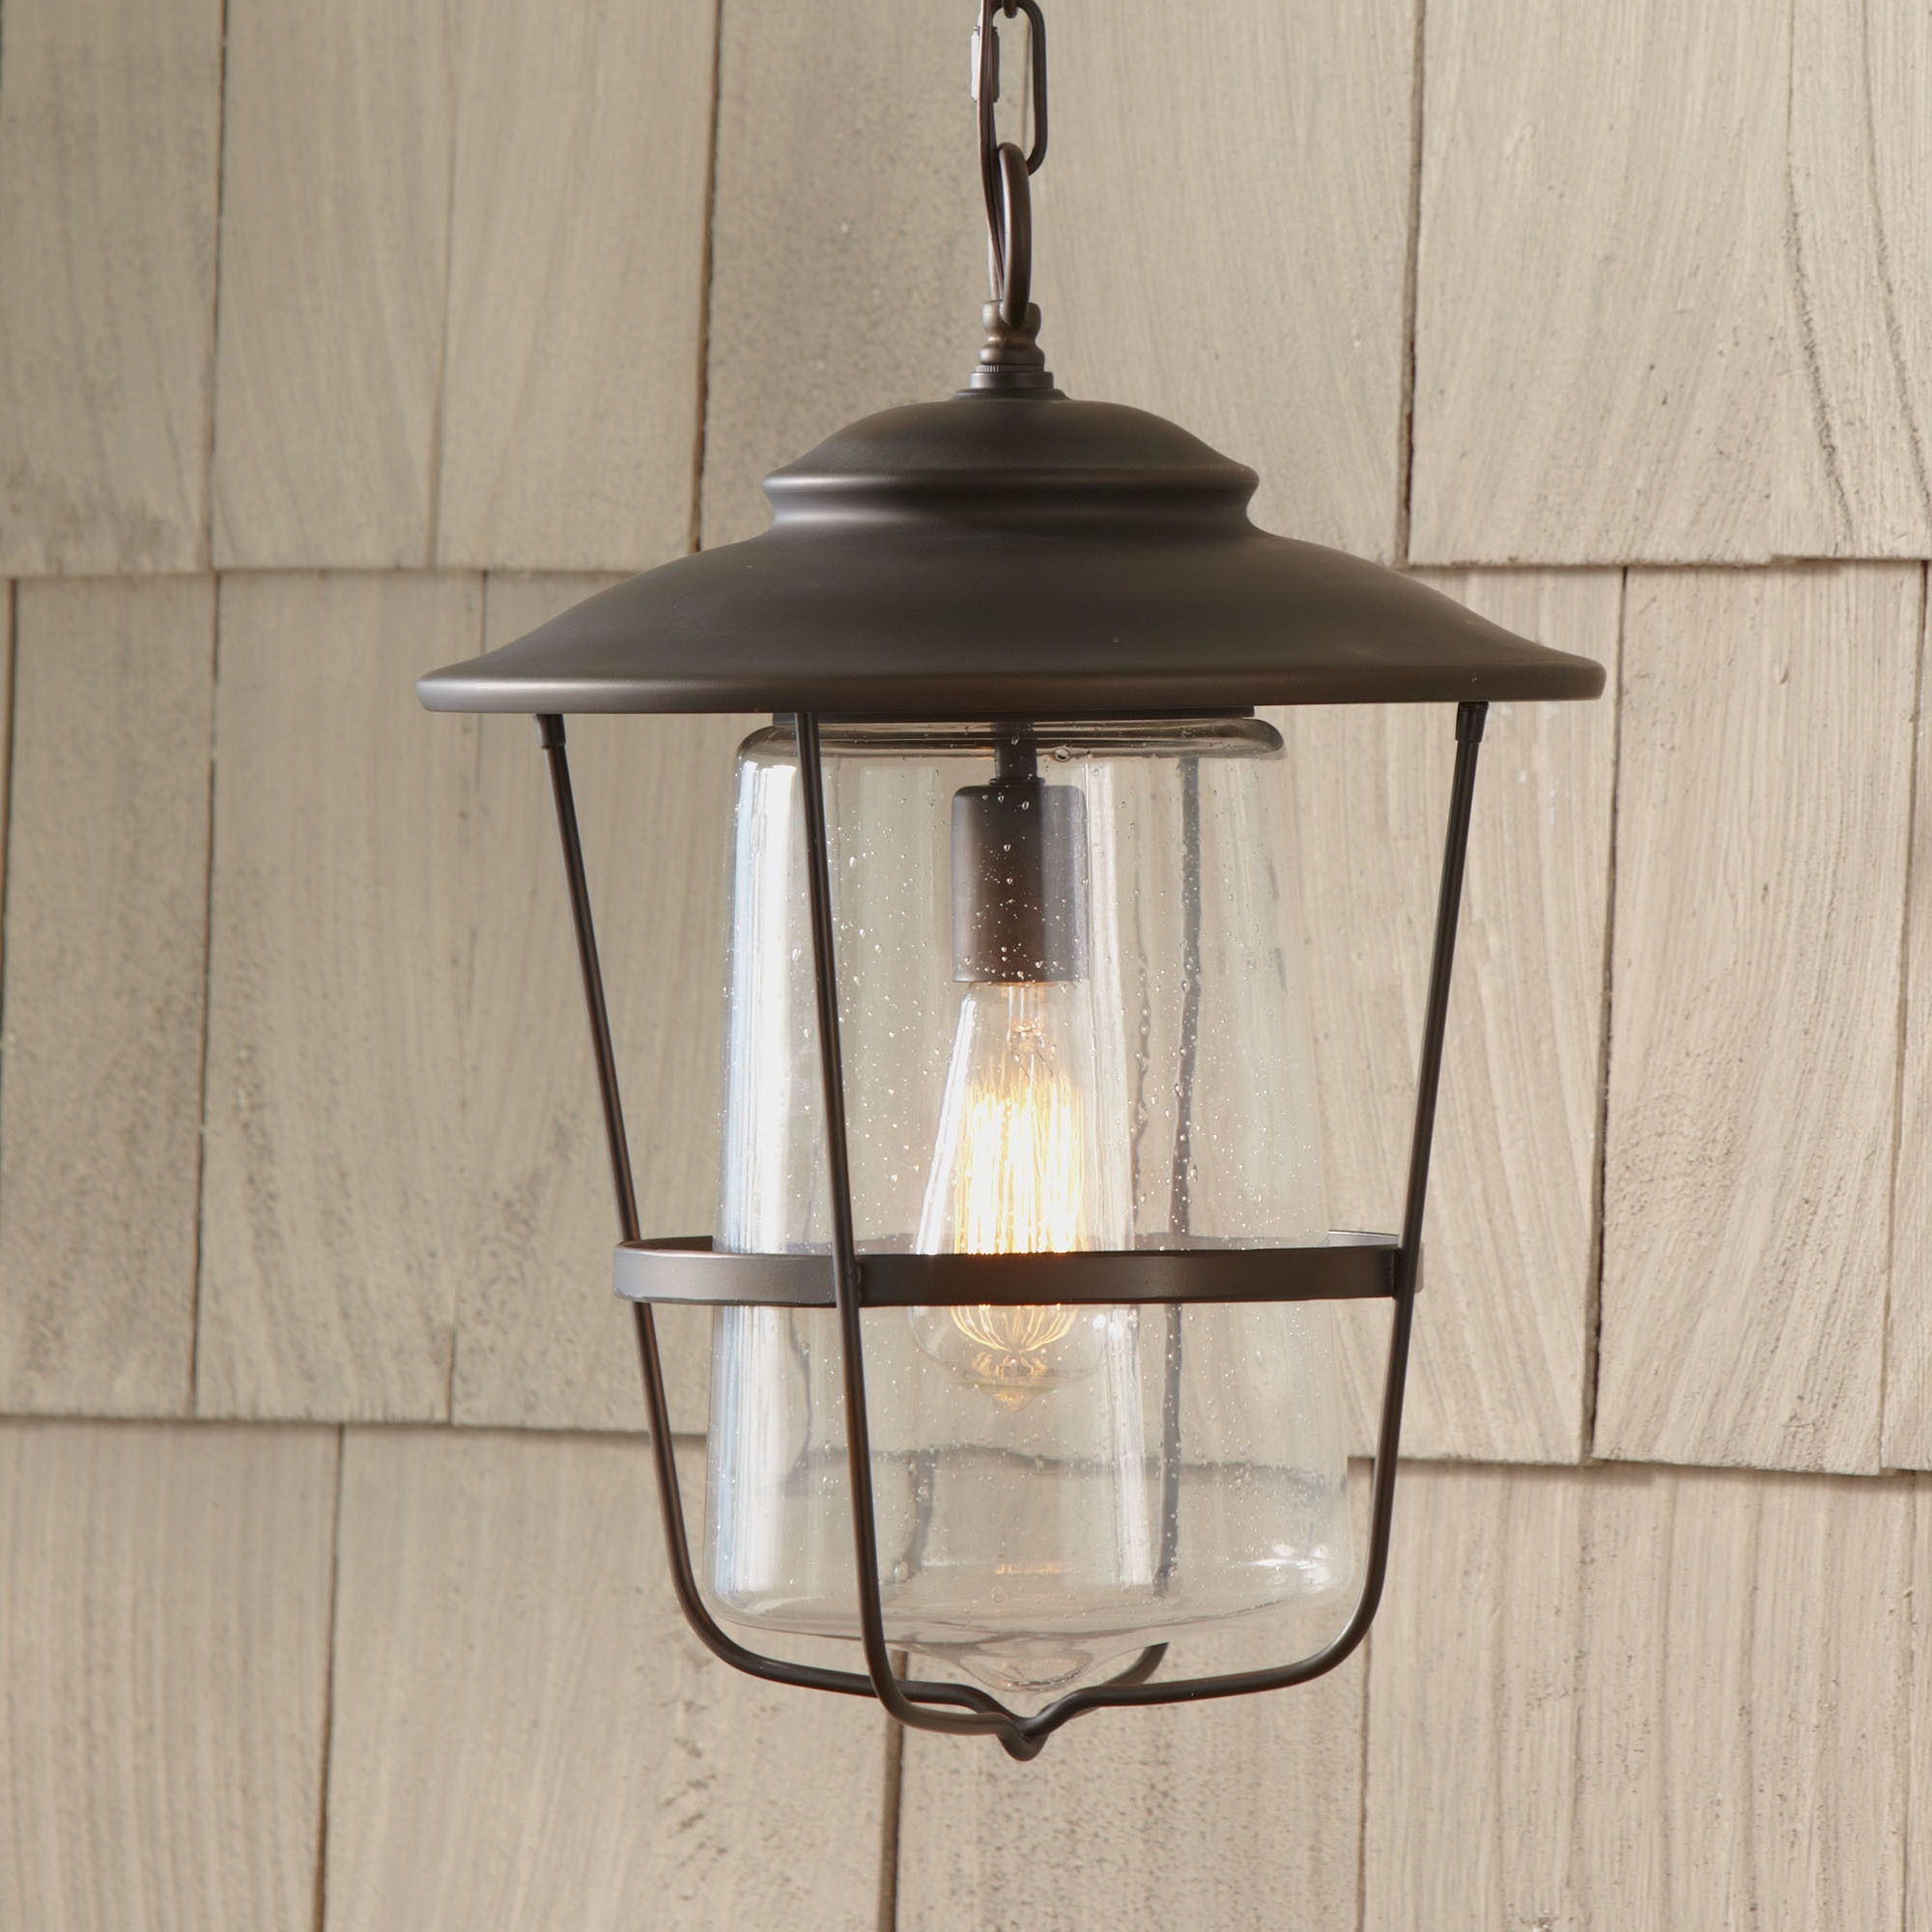 Modern Rustic Outdoor Lighting Att Wayfair For Current Outdoor Hanging Lights Wayfair Remington Lantern ~ Loversiq (Gallery 2 of 20)